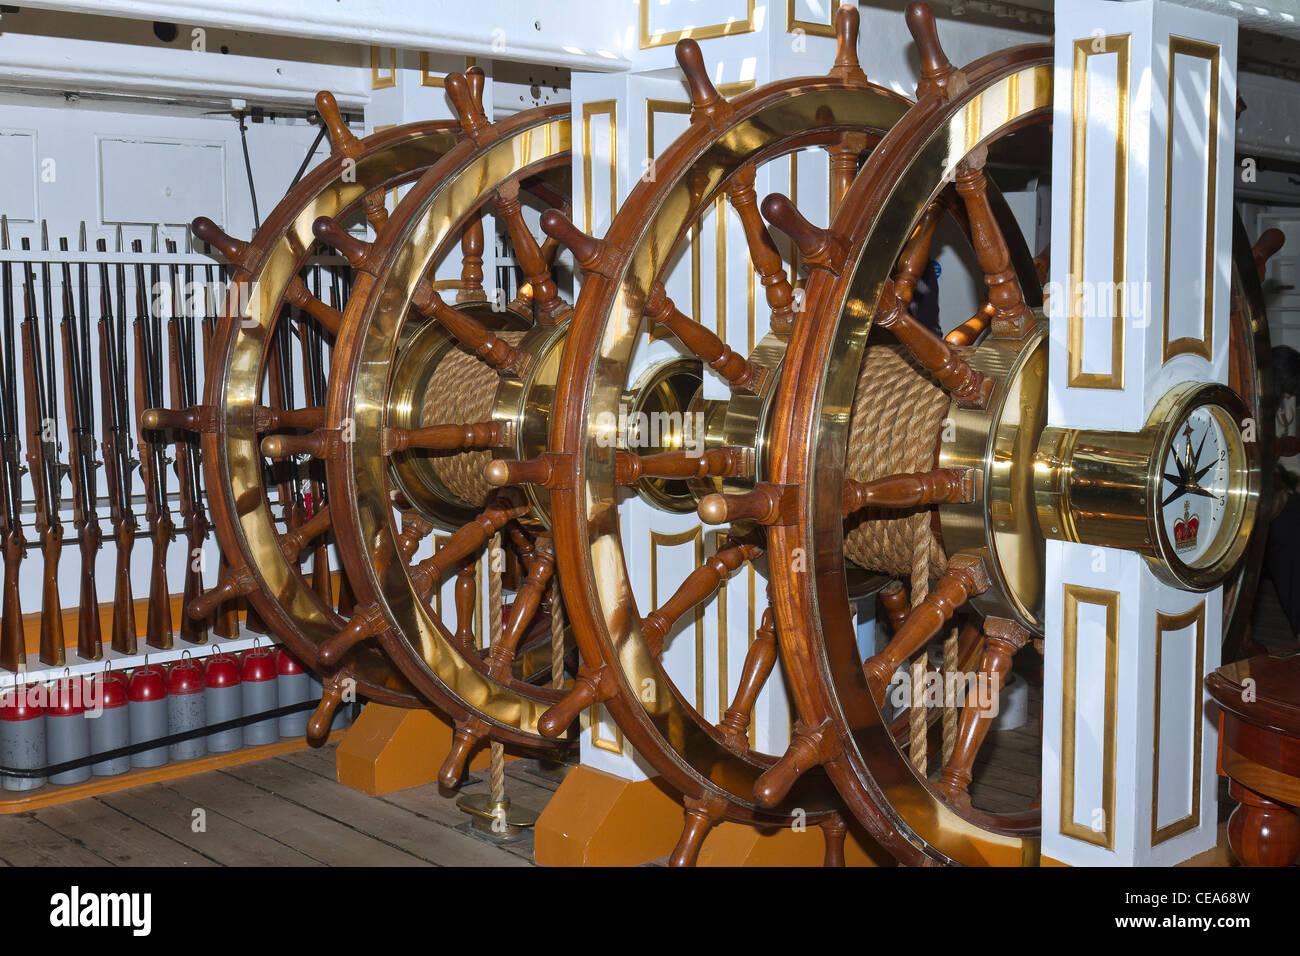 UK Hampshire Sailing Ships Steering Gear - Stock Image